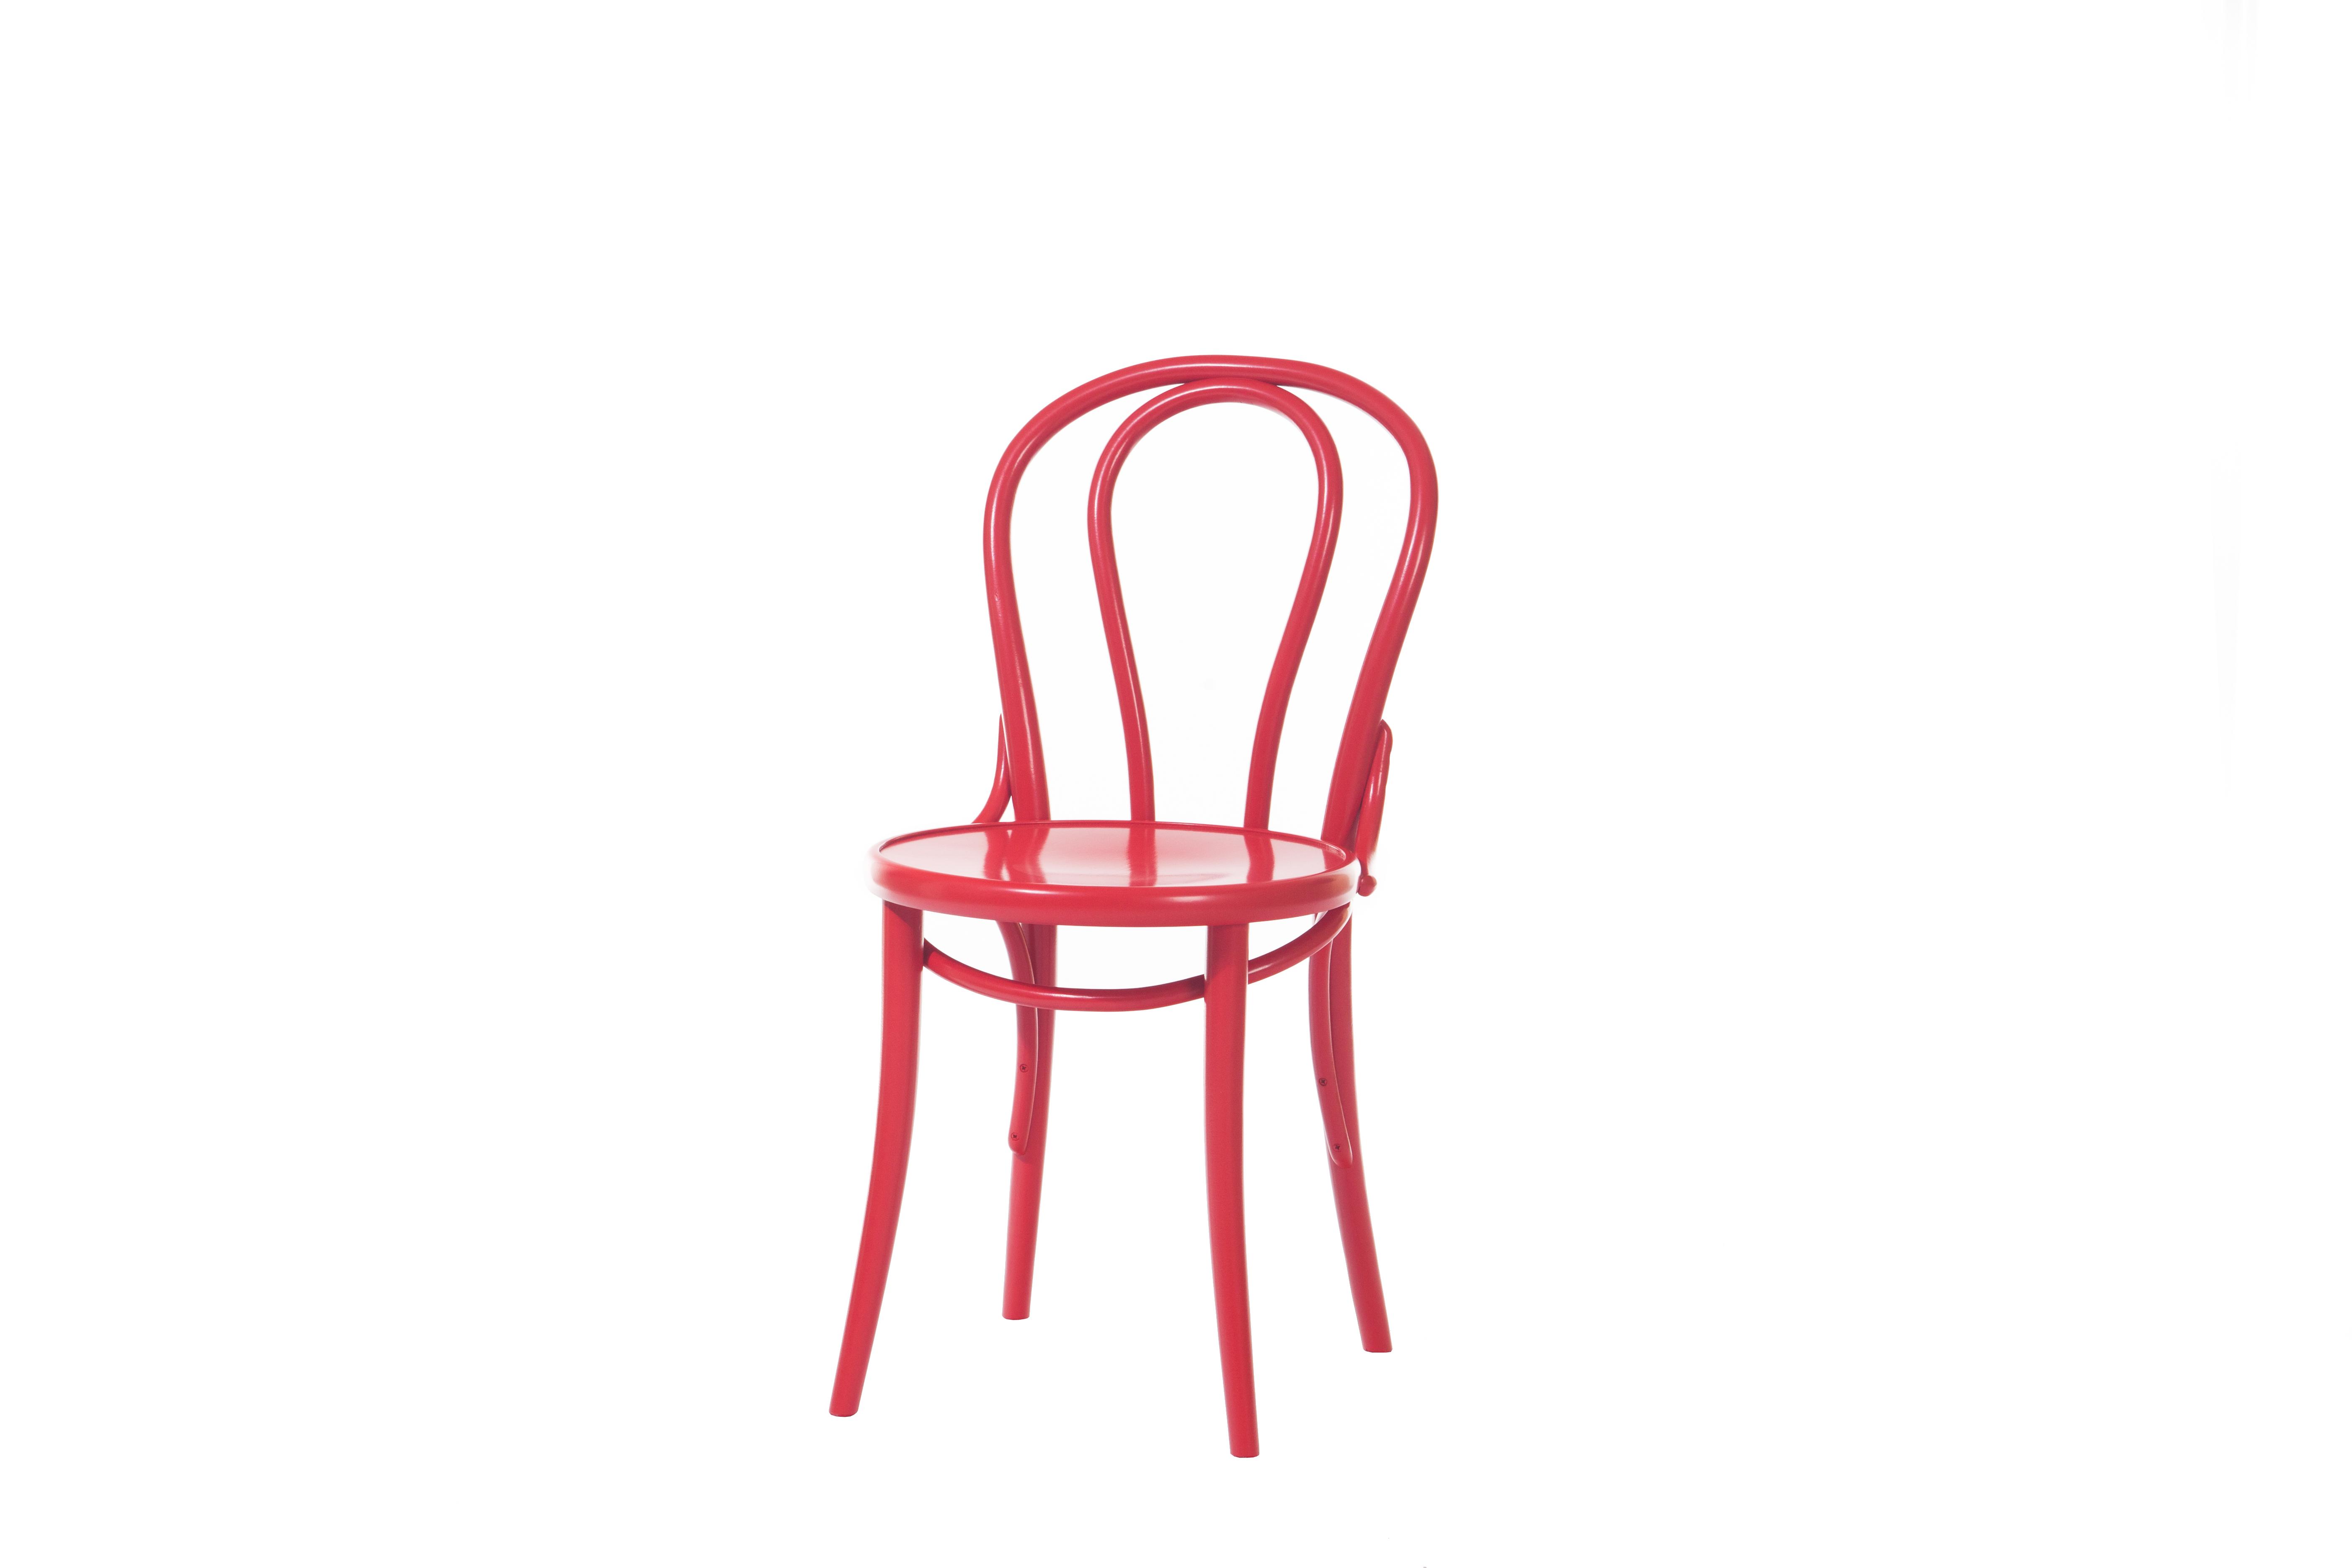 Scaun din lemn de fag 18 Red l41xA515xH84 cm